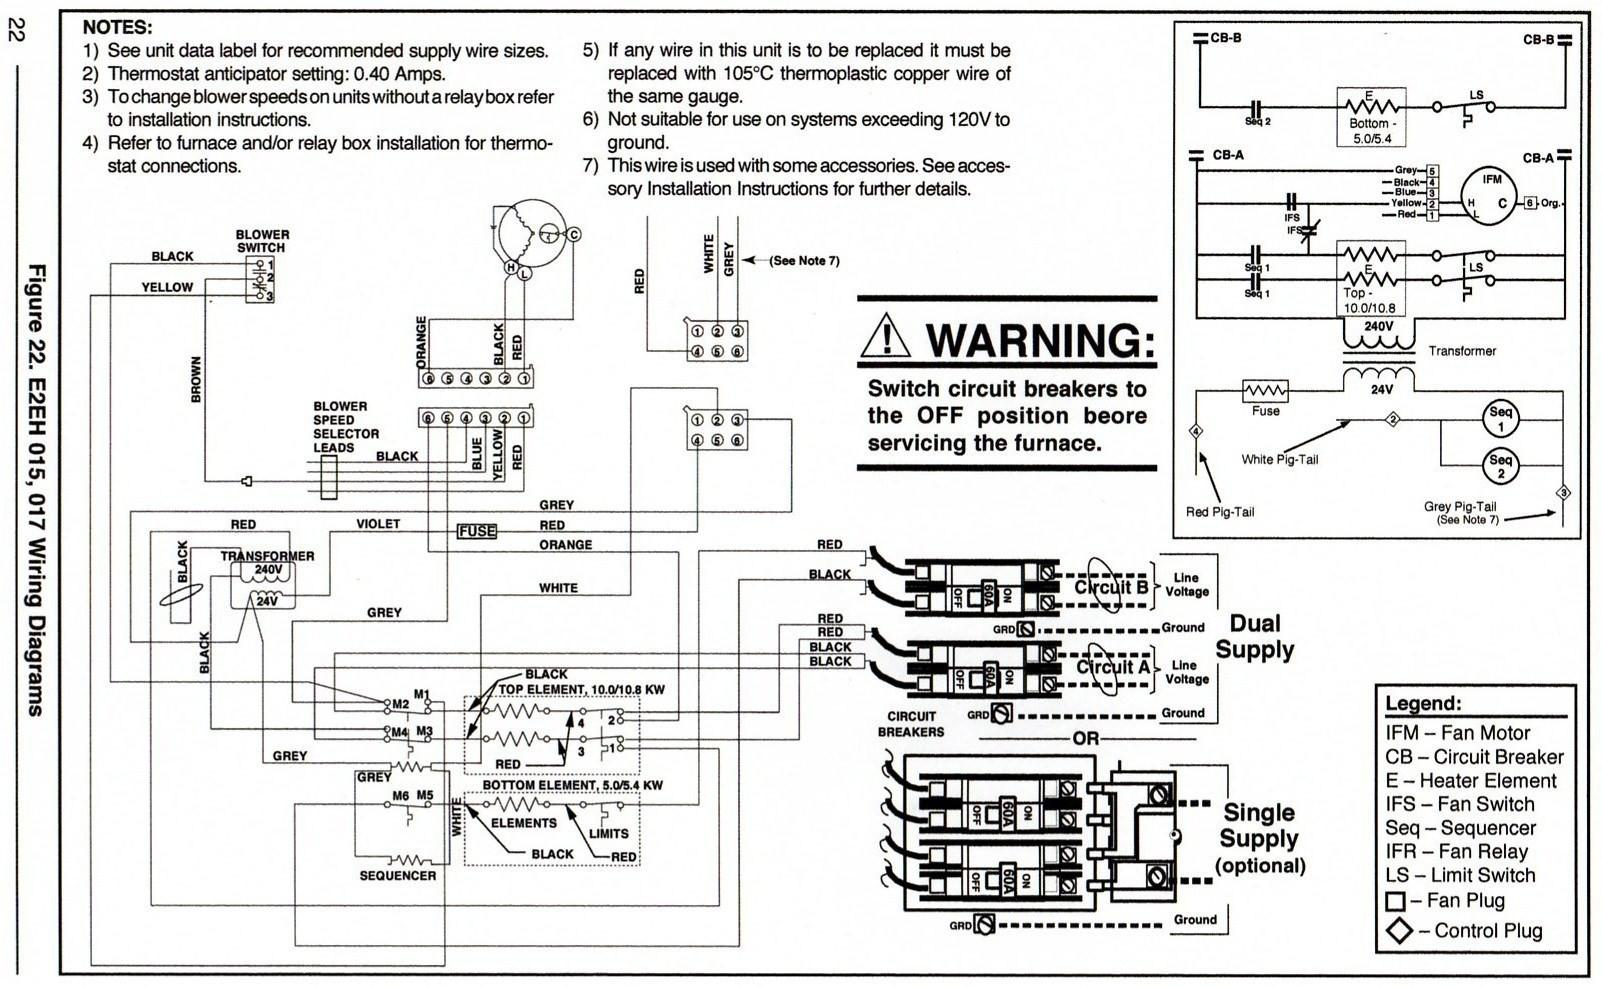 Furnace Blower Motor Wiring Diagram Beautiful Circuit Intertherm Wiring  Diagram Furnace Blower Motor Best Electric